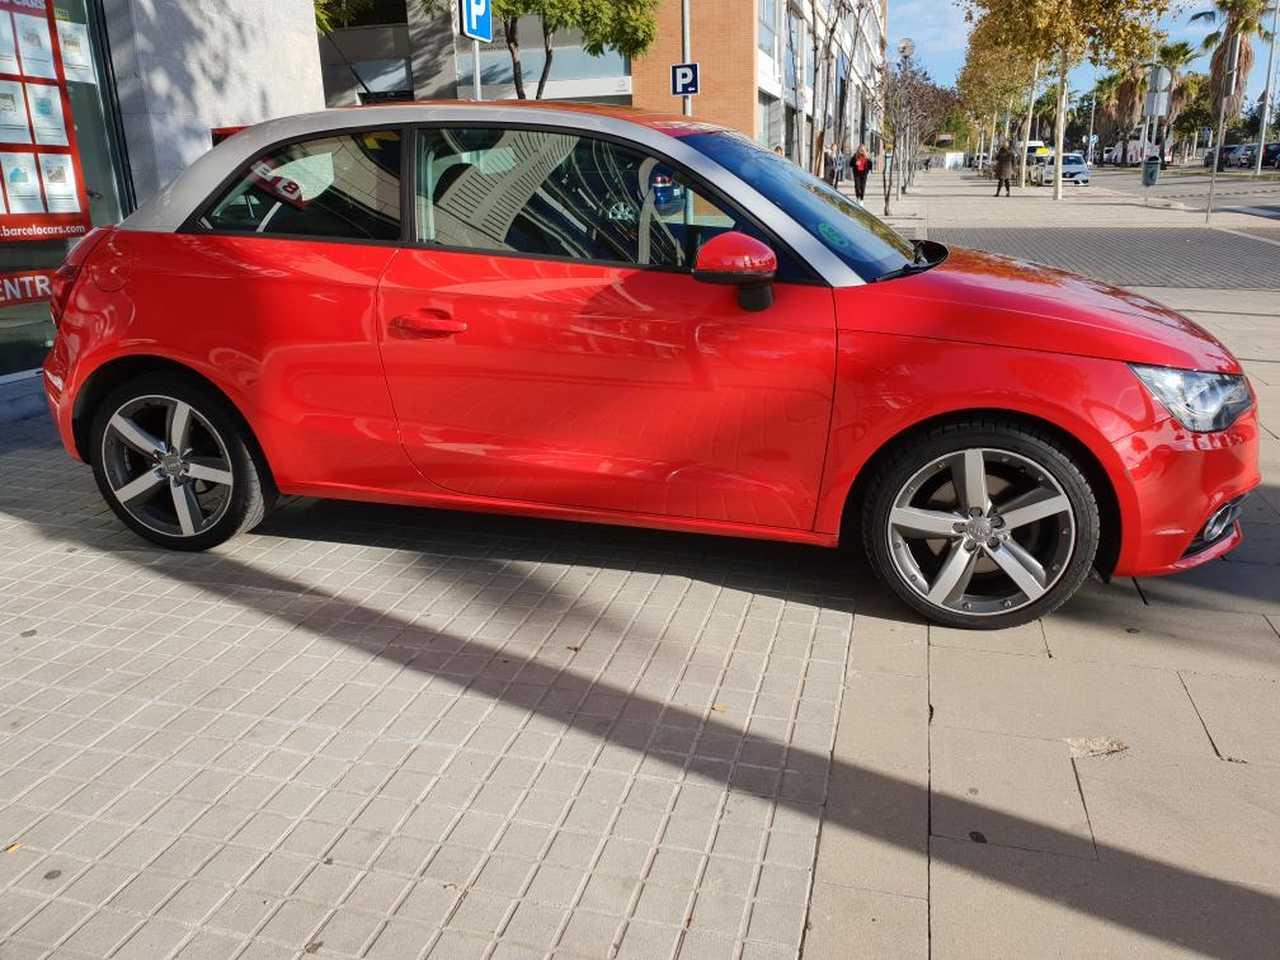 Audi A1 1.4 Tfsi Ambition Automatico  - Foto 1